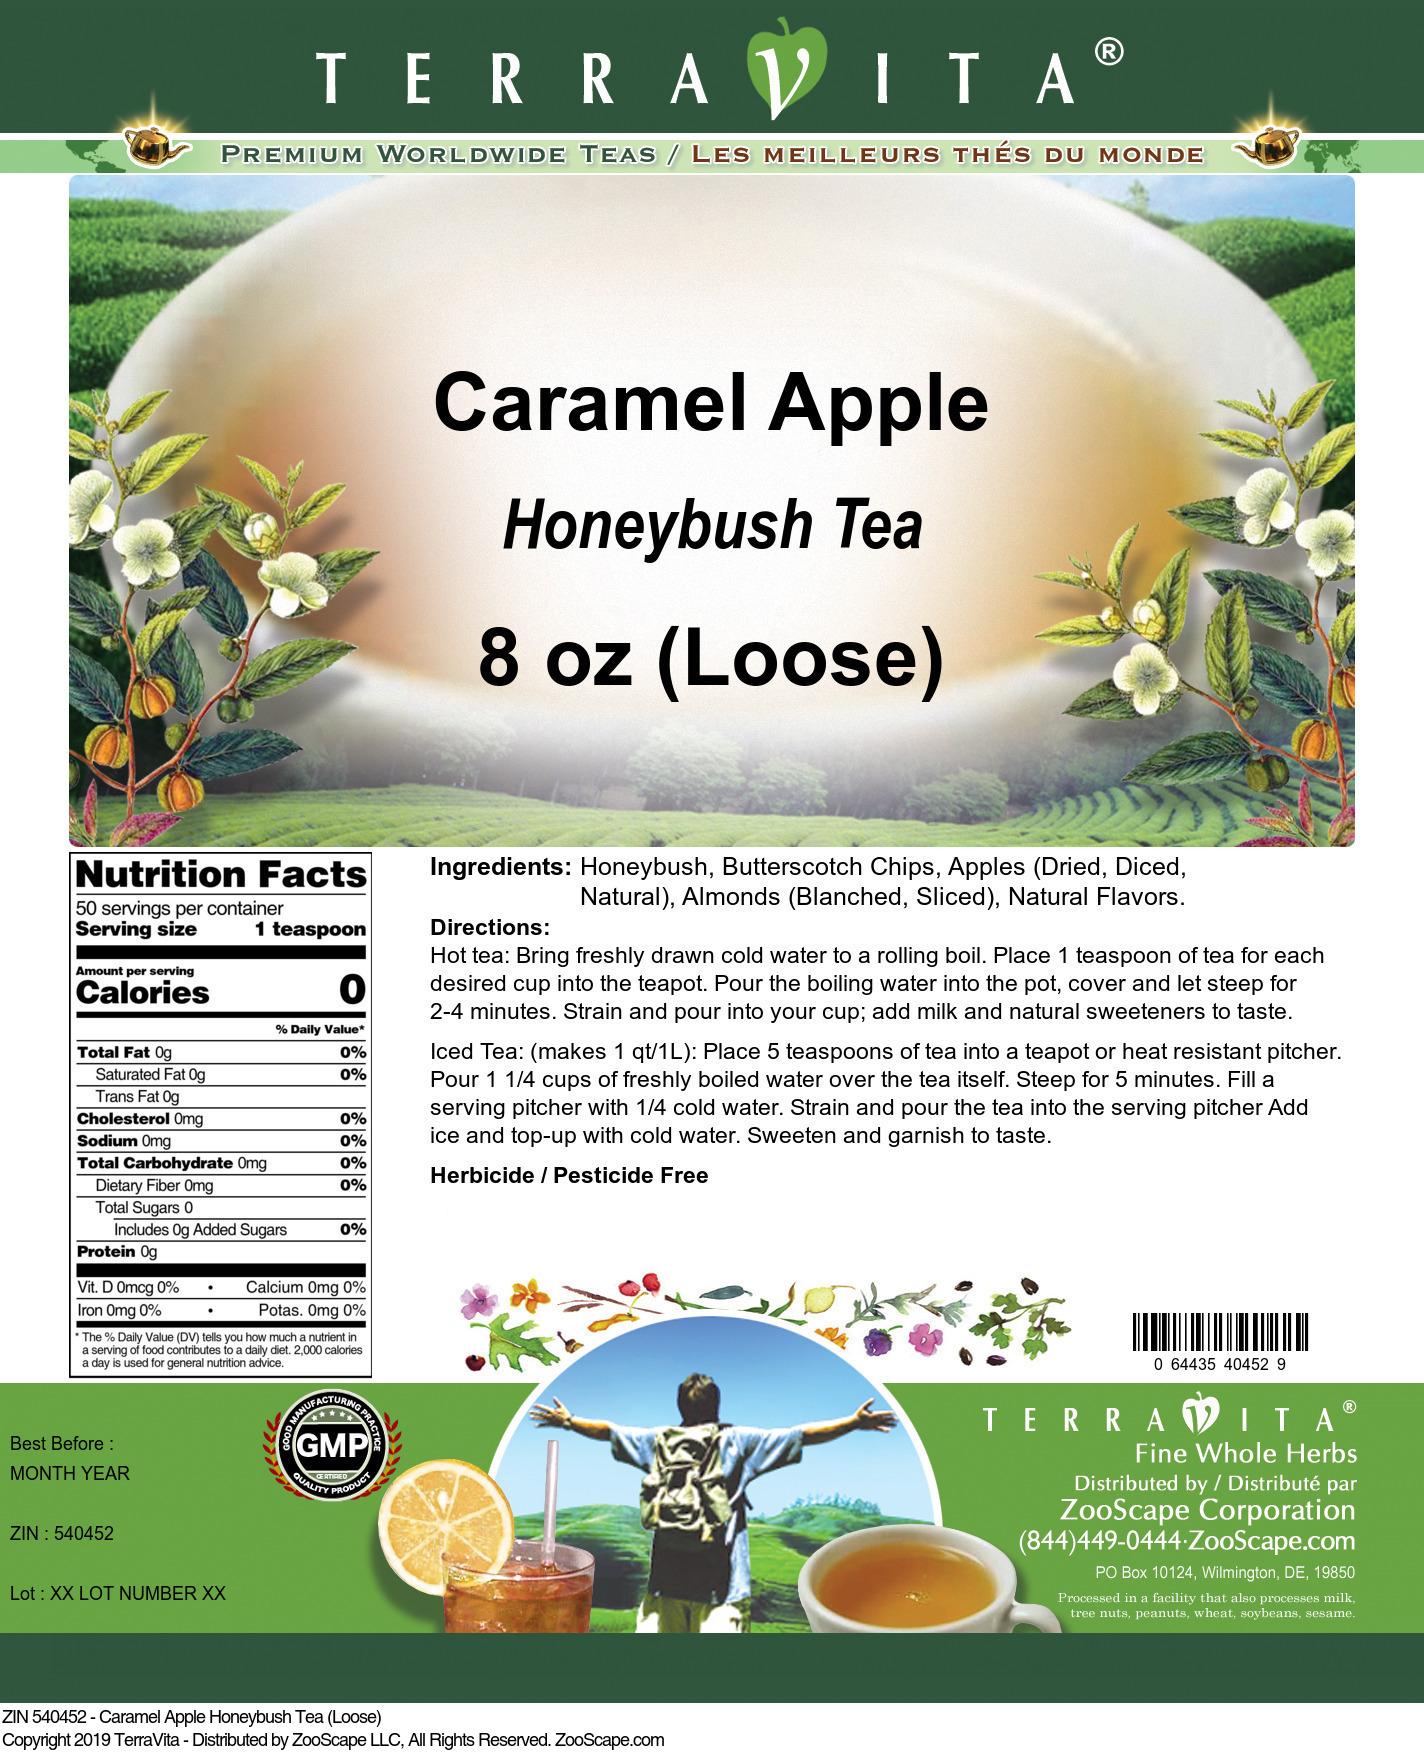 Caramel Apple Honeybush Tea (Loose)